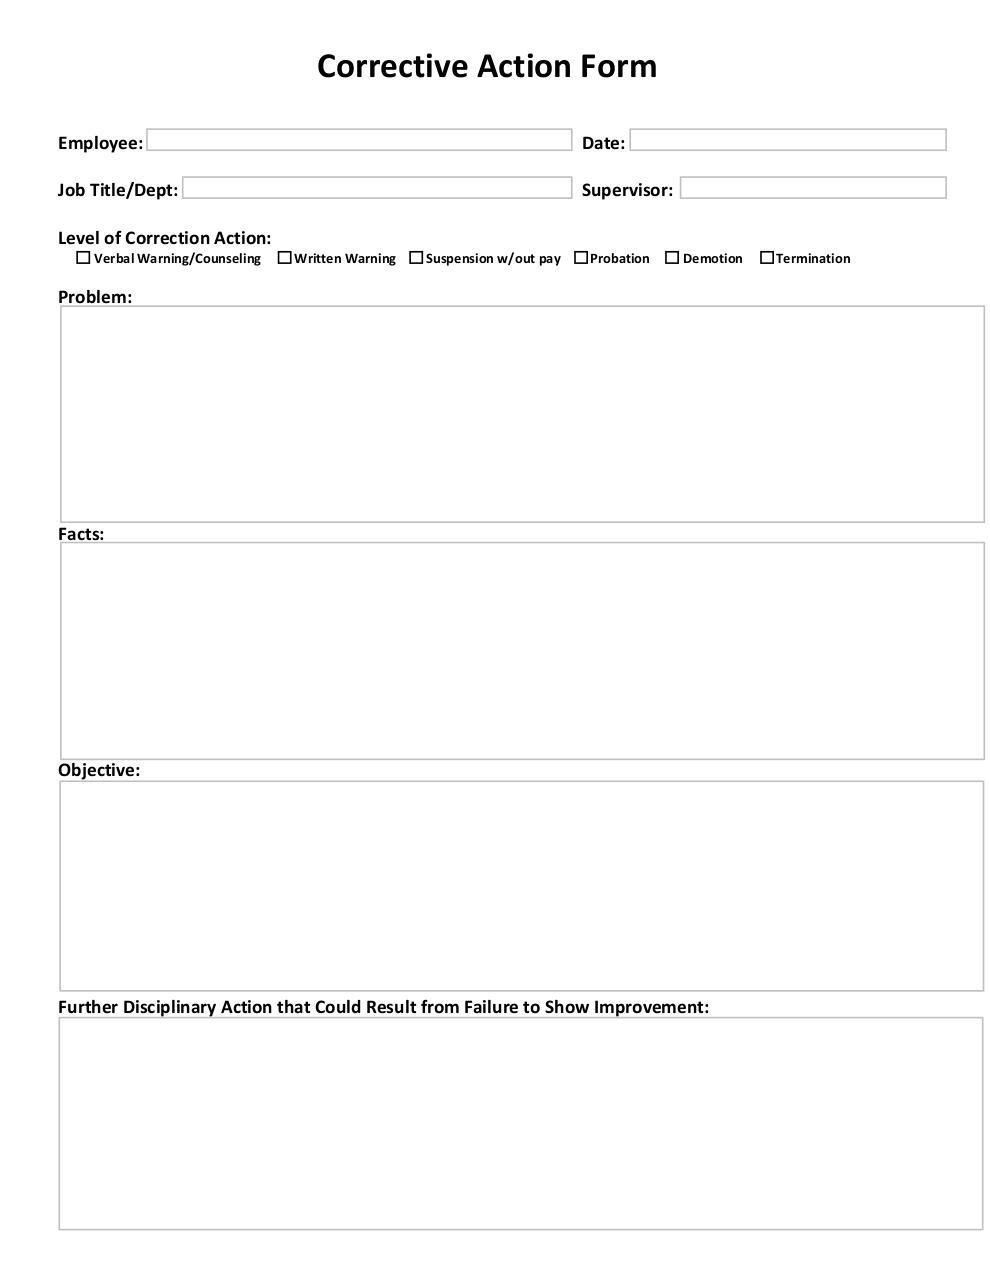 Microsoft Word - Corrective Action Form.doc (Corrective Action ...